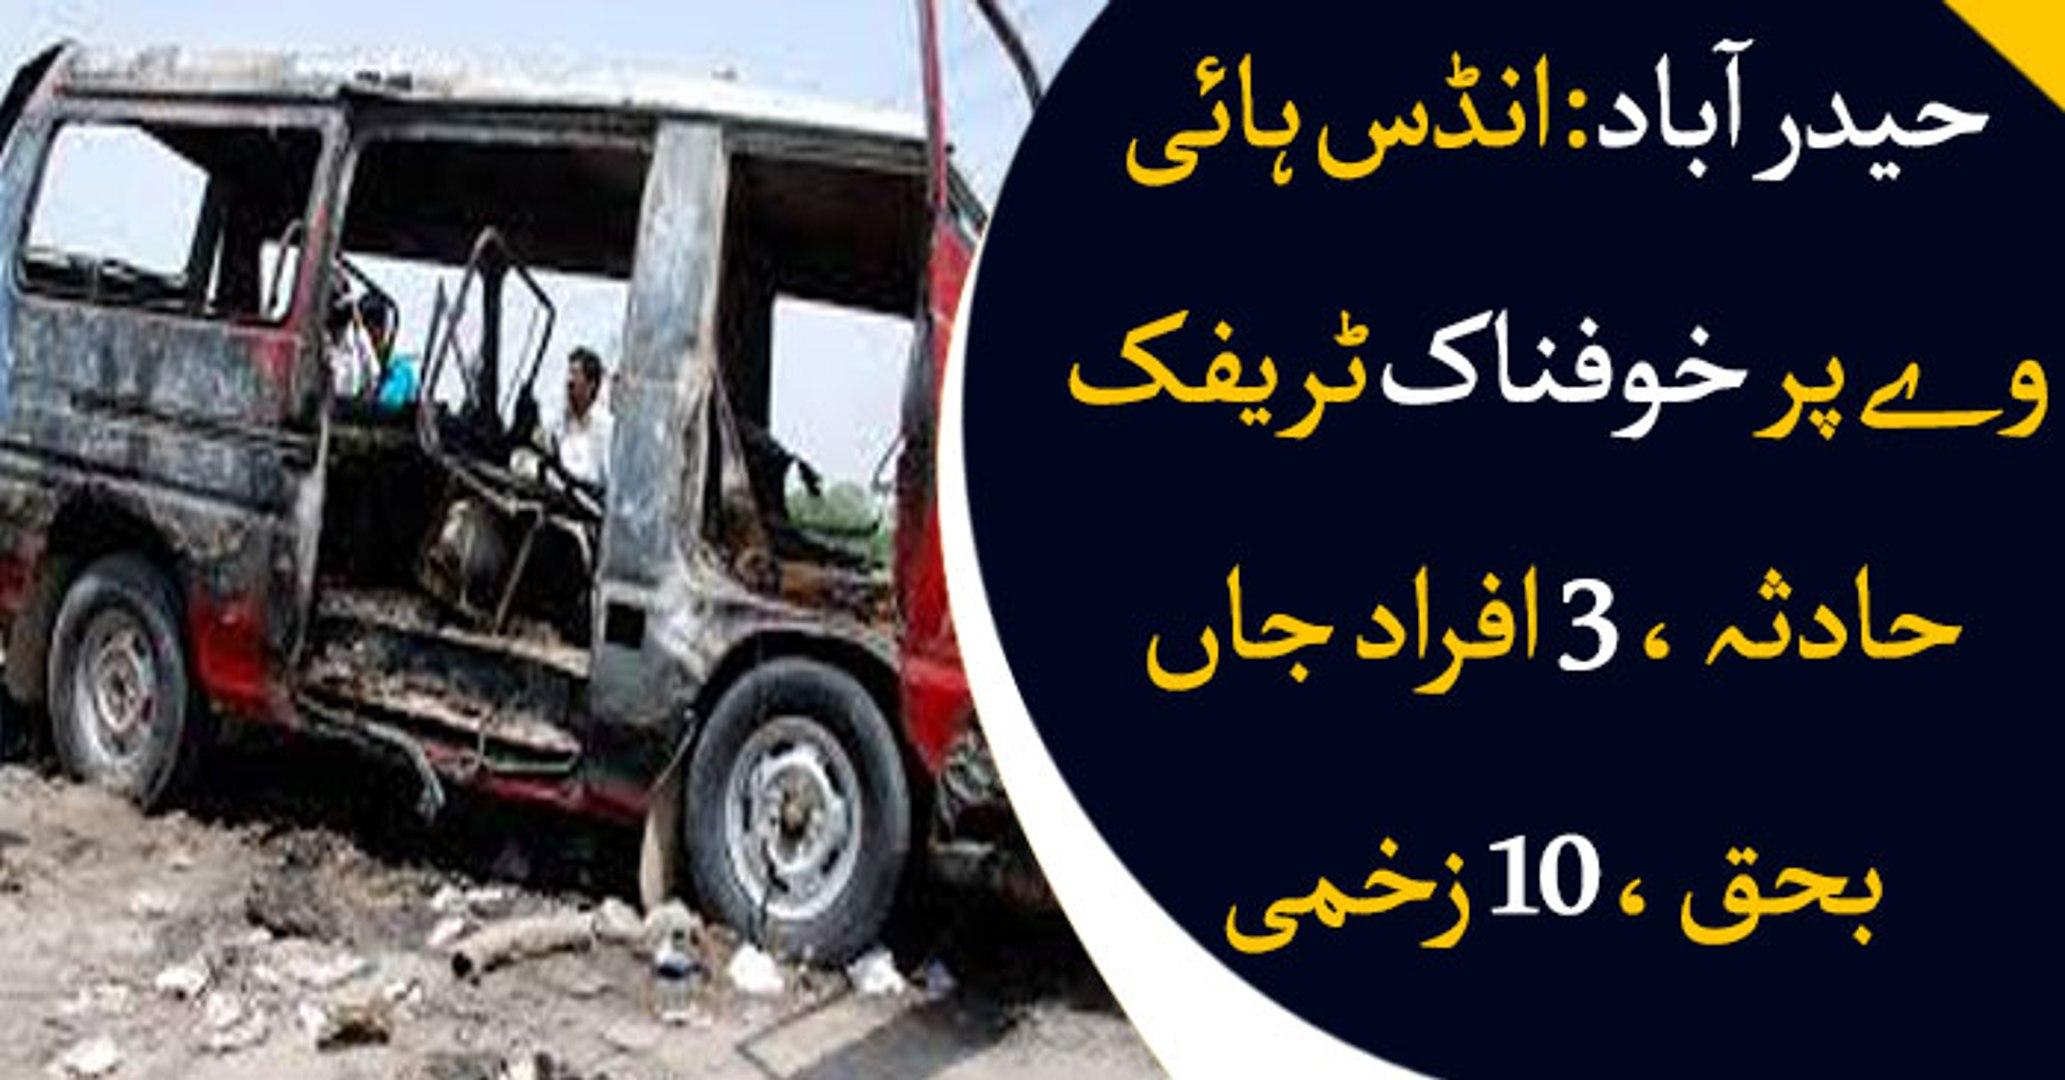 Hyderabad: 3 killed, 10 injured in indus highway accident